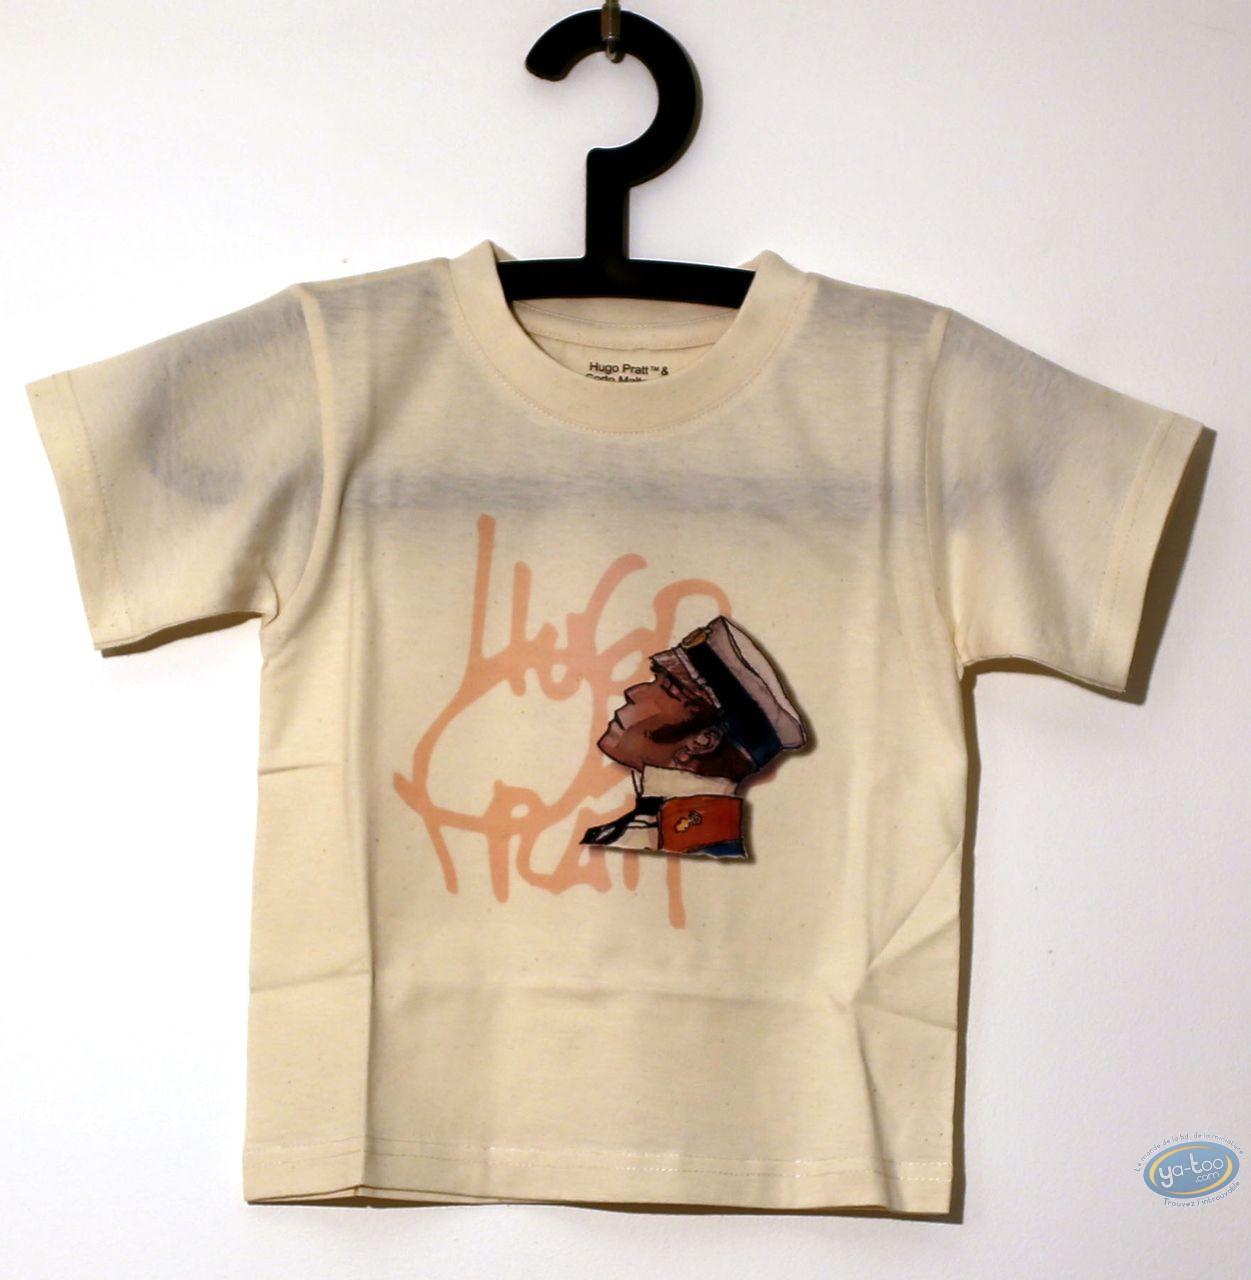 Clothes, Corto Maltese : T-shirt, Corto Maltese : Kid 02/02 - 5/6 years